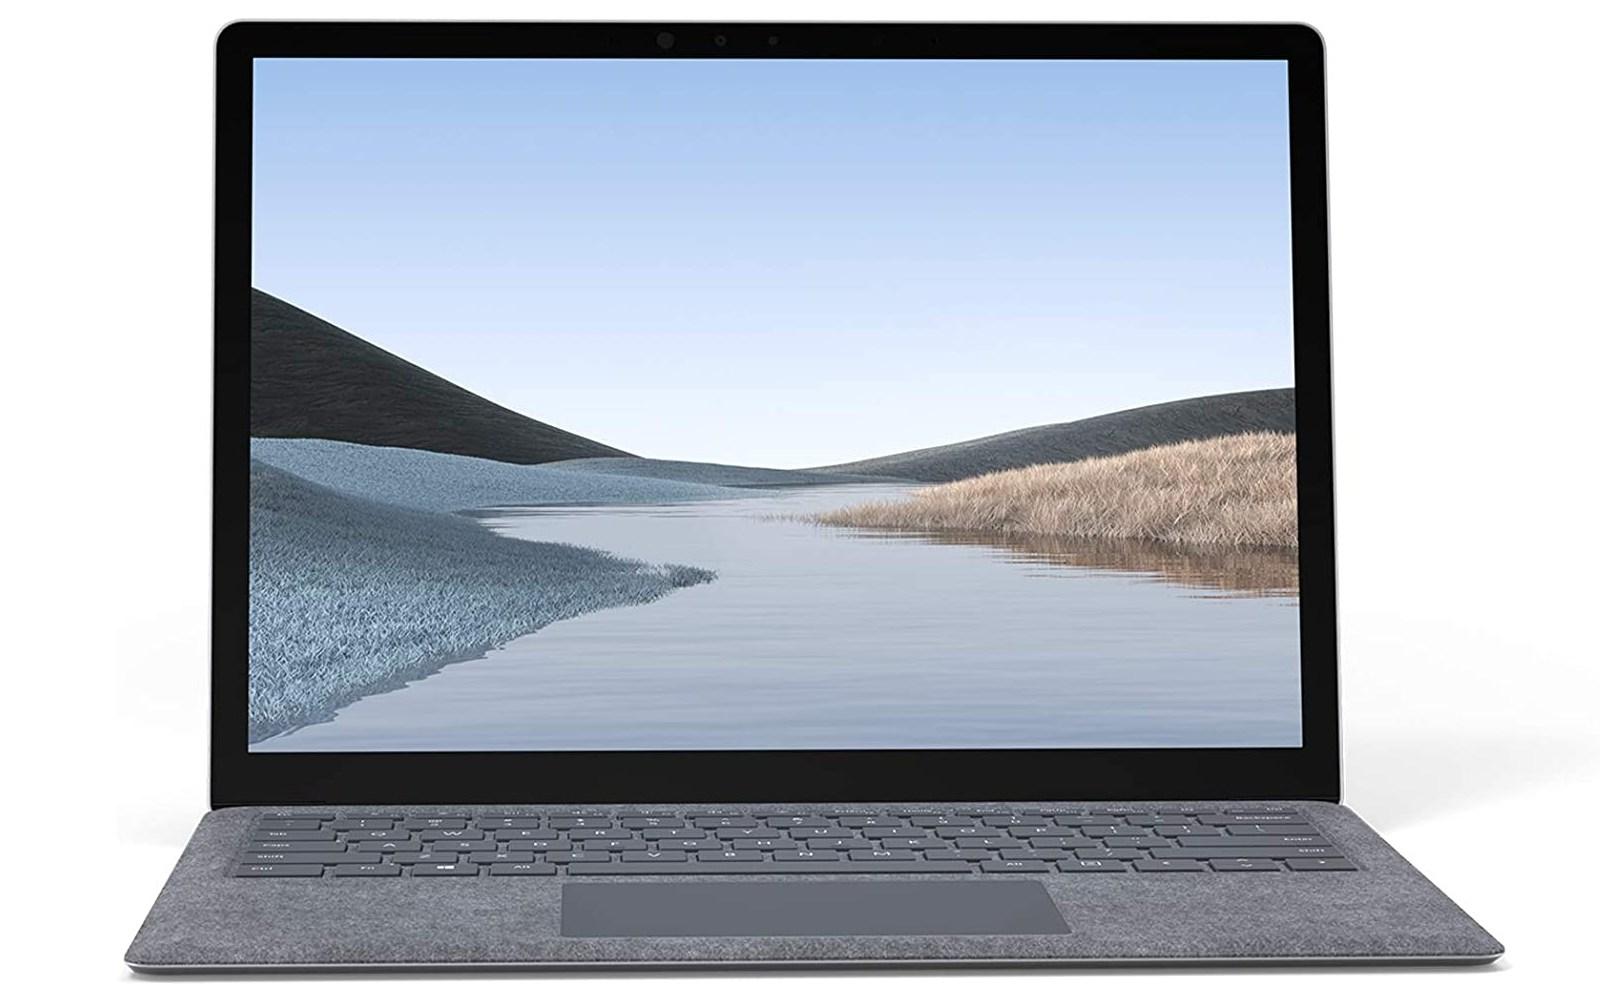 13,5 tuuman Microsoft Surface Laptop 4. Kuva: WinFuture.de.